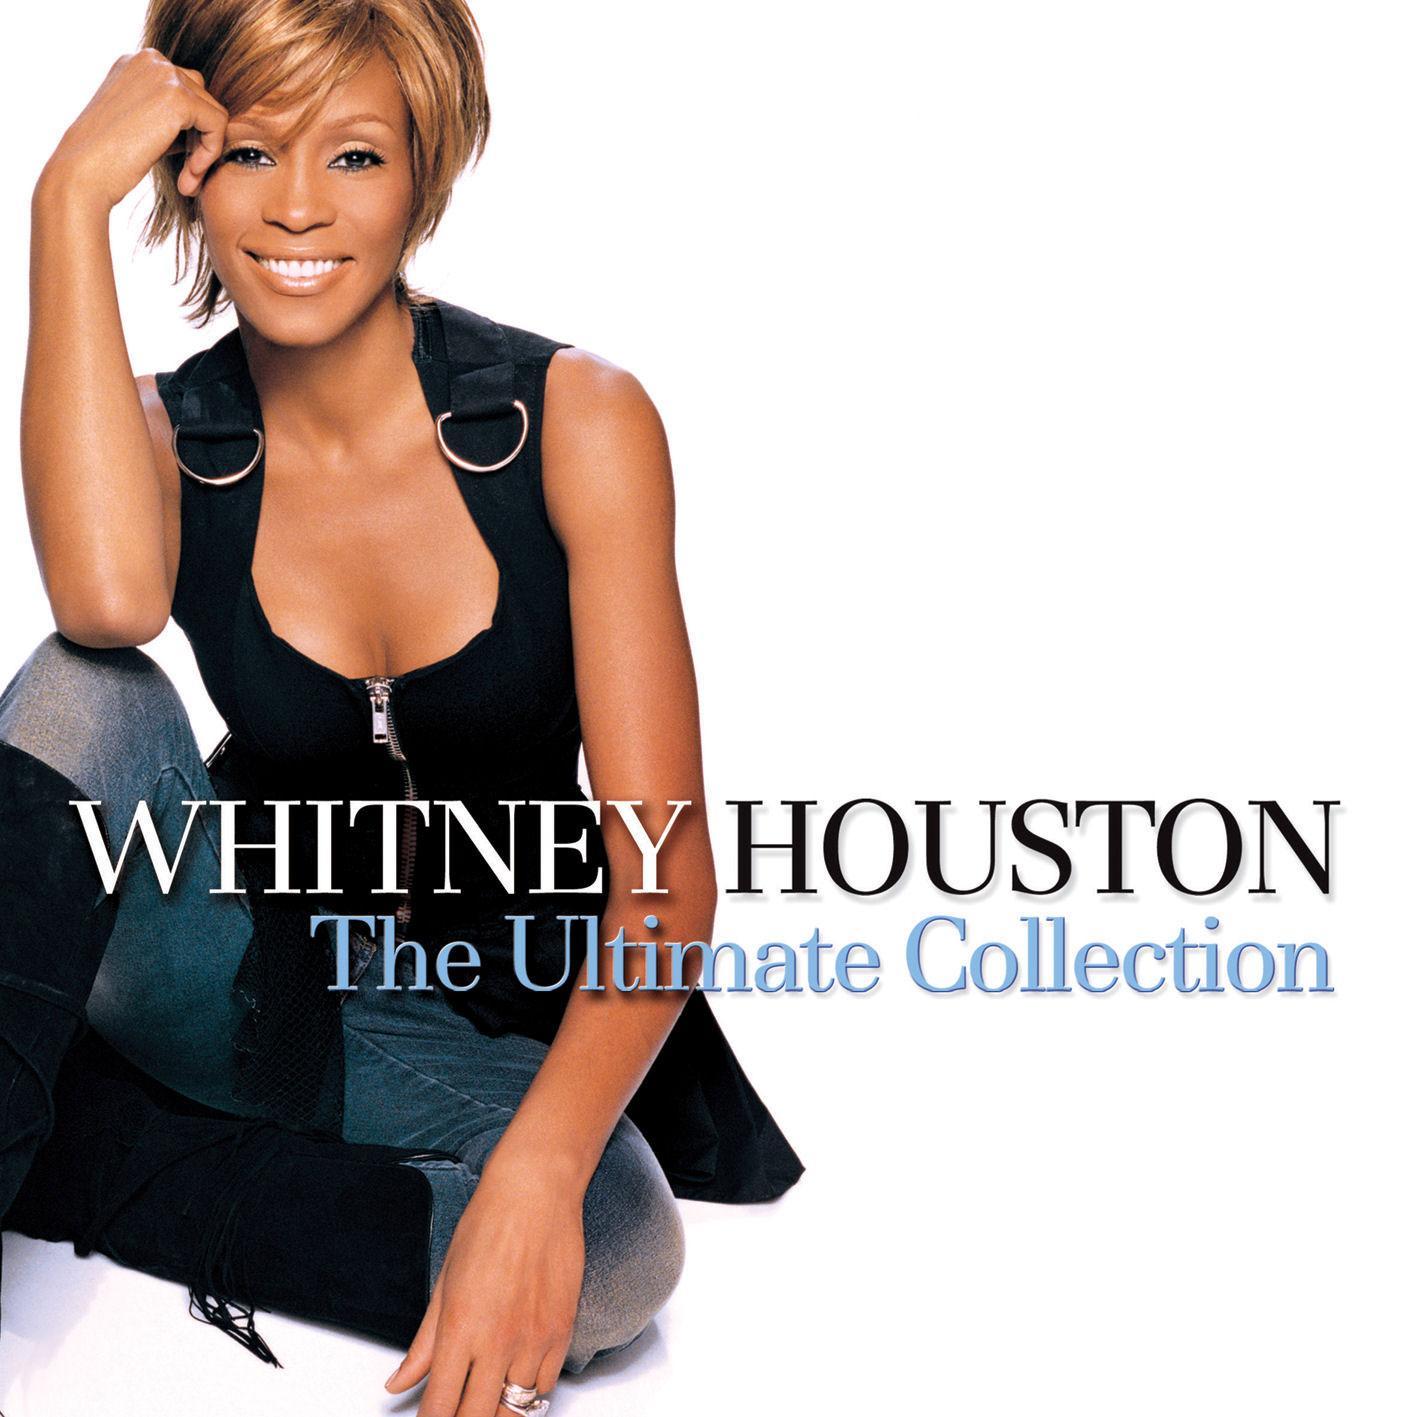 Download: whitney houston vs rihanna – i wanna dance with somebody.